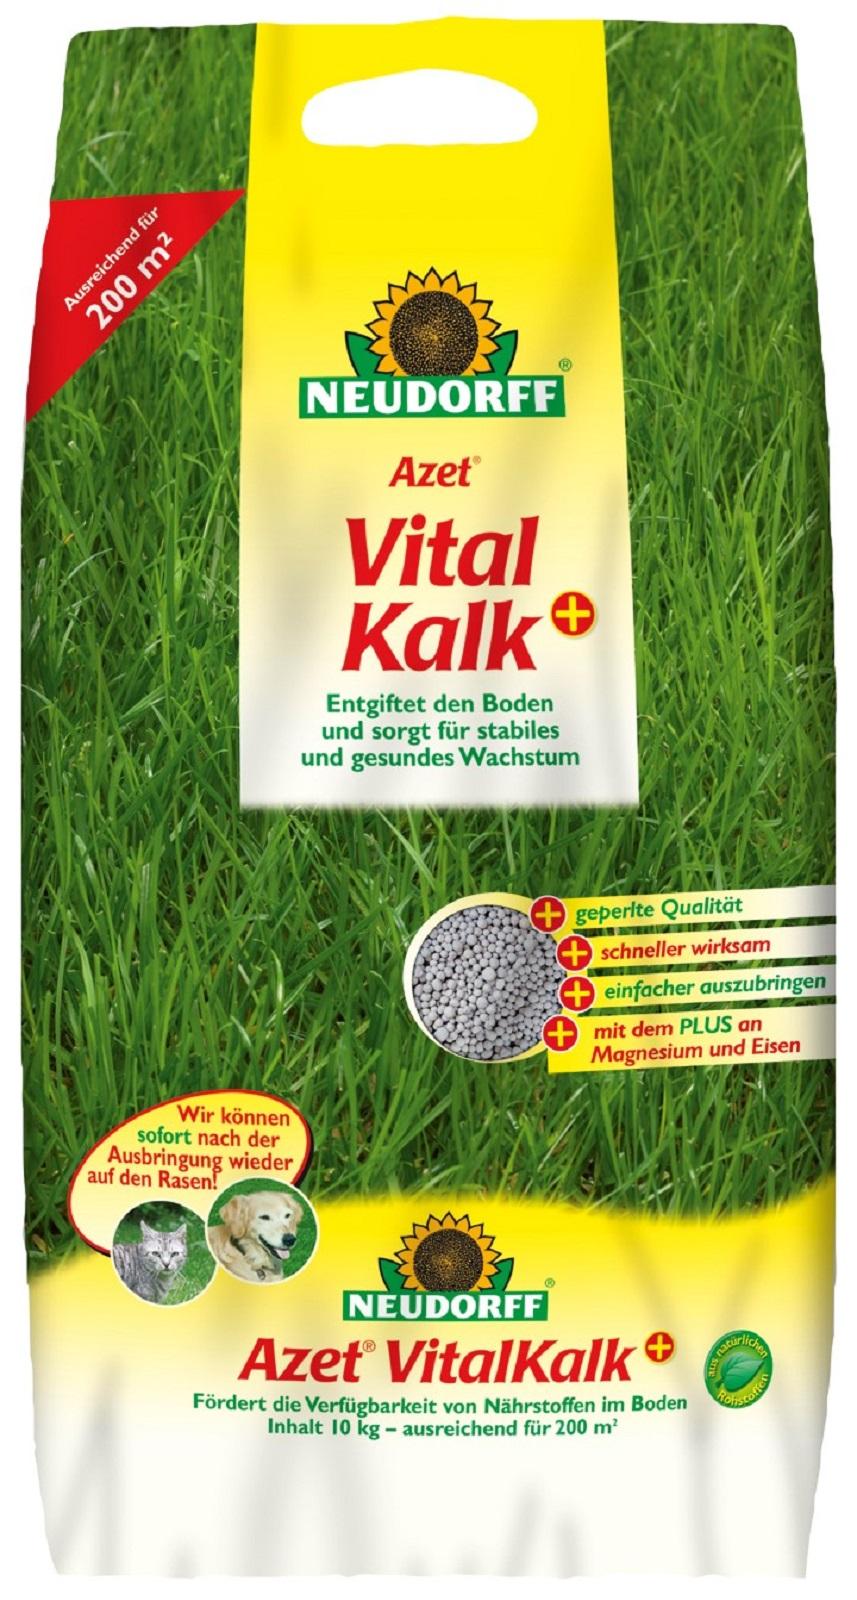 Neudorff Azet RasenKalk10 kg